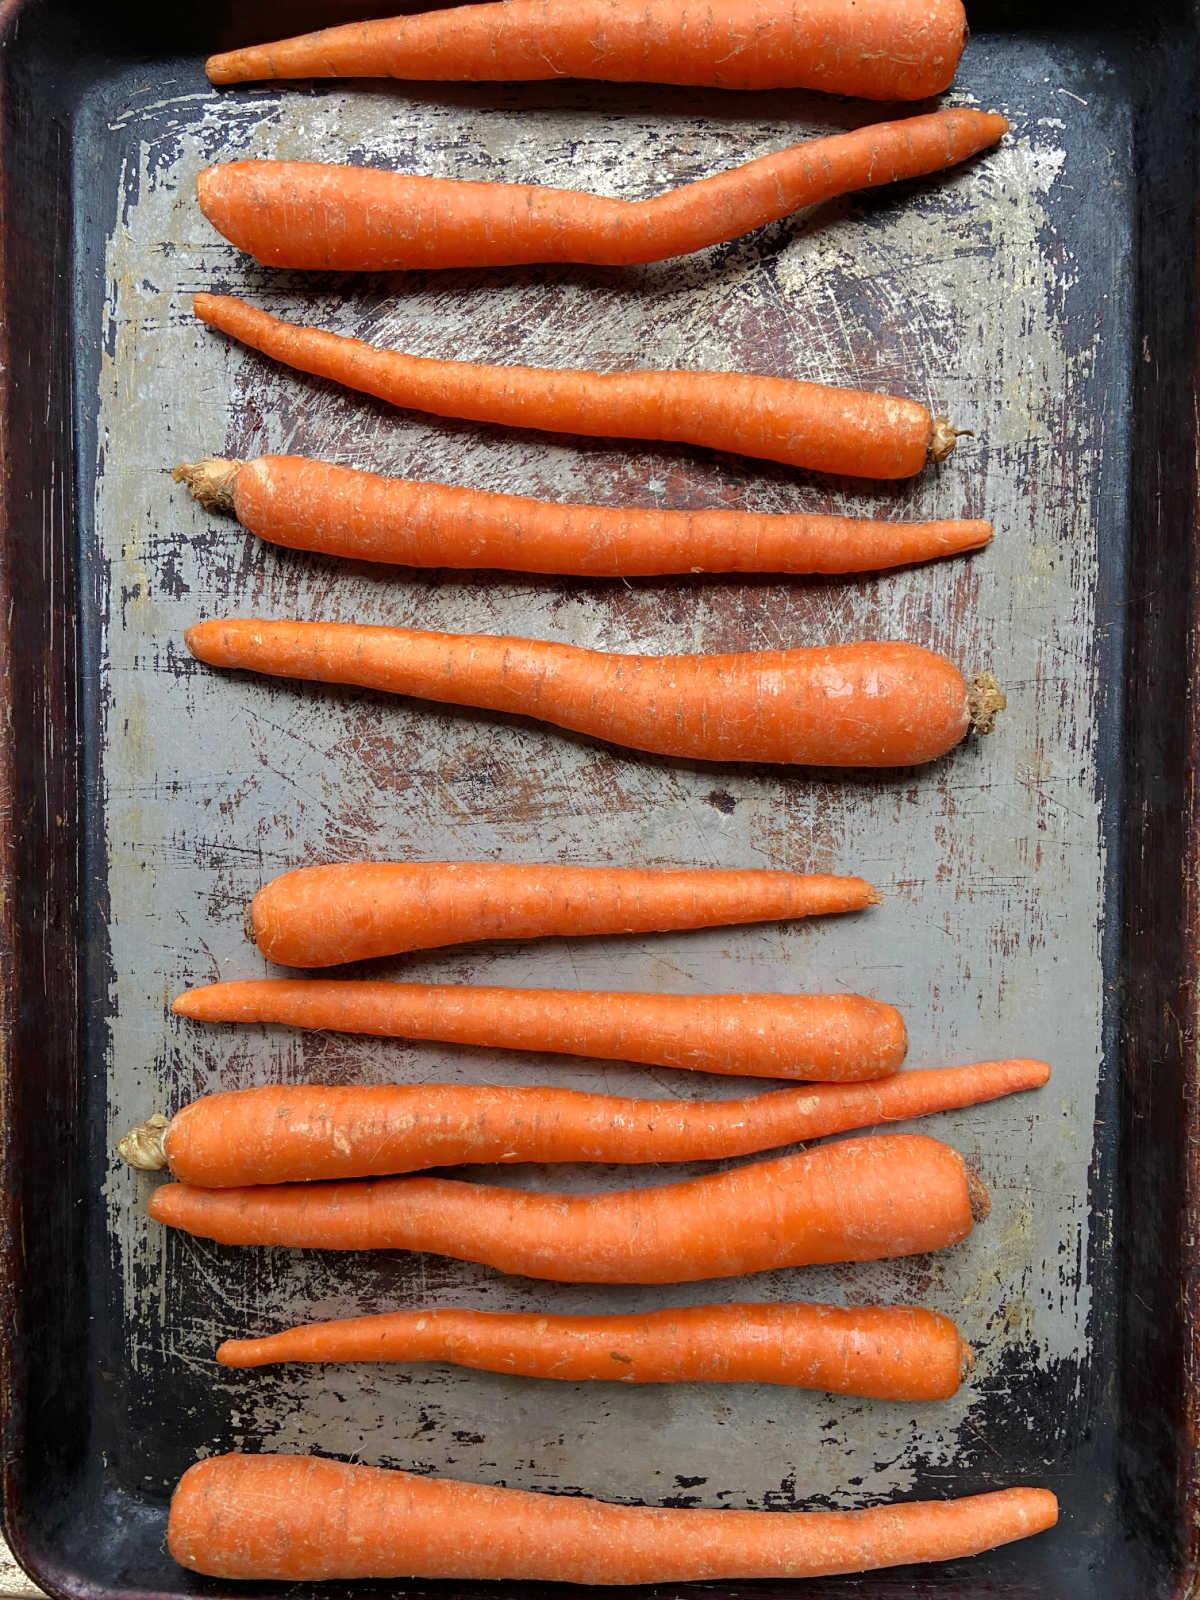 raw carrots on a baking sheet.